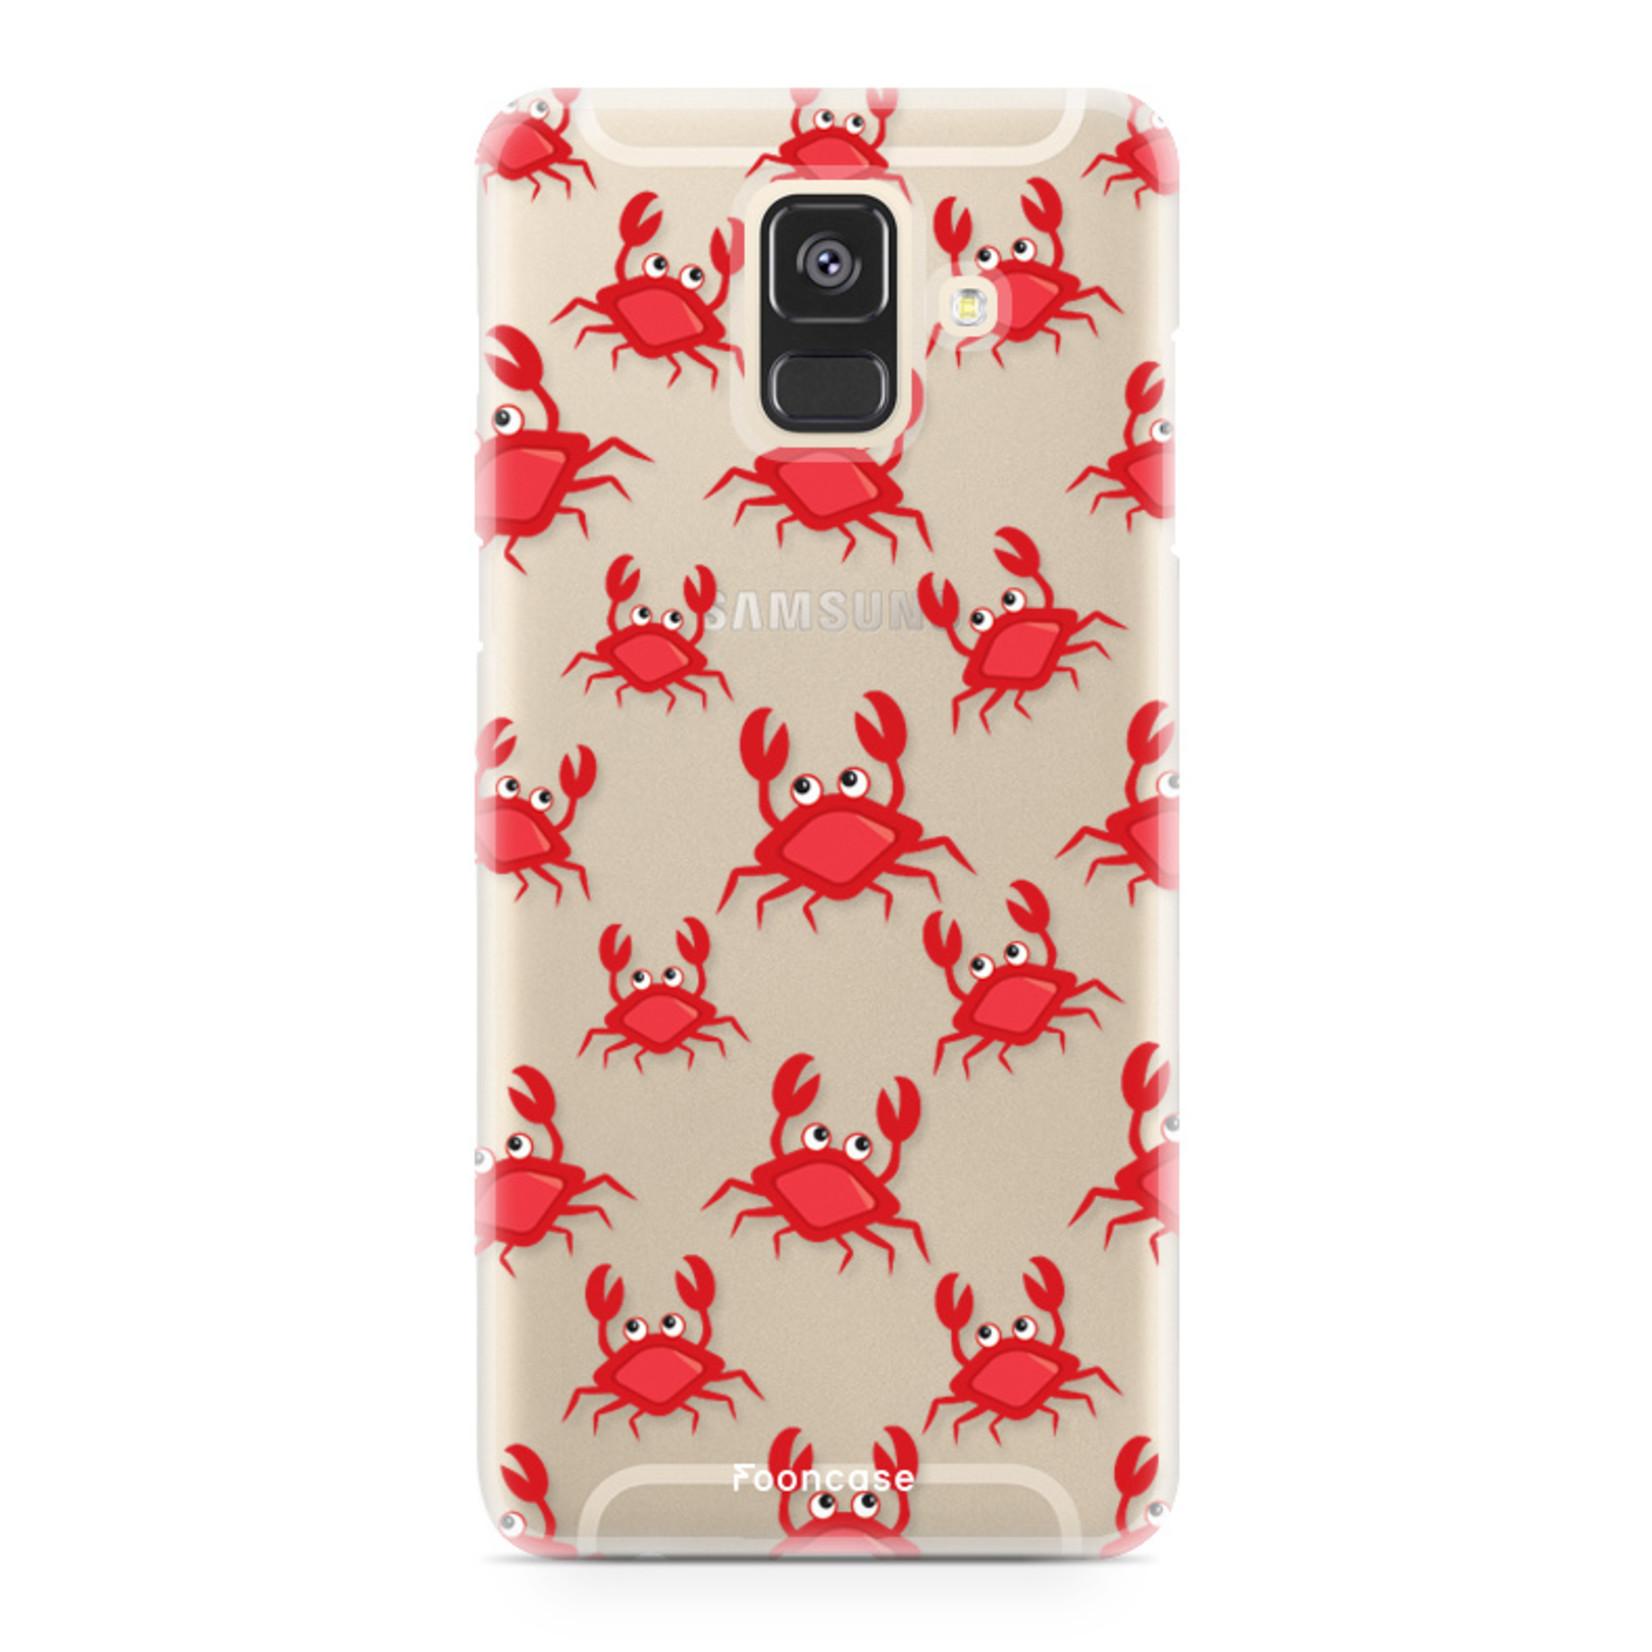 FOONCASE Samsung Galaxy A6 2018 hoesje TPU Soft Case - Back Cover - Crabs / Krabbetjes / Krabben